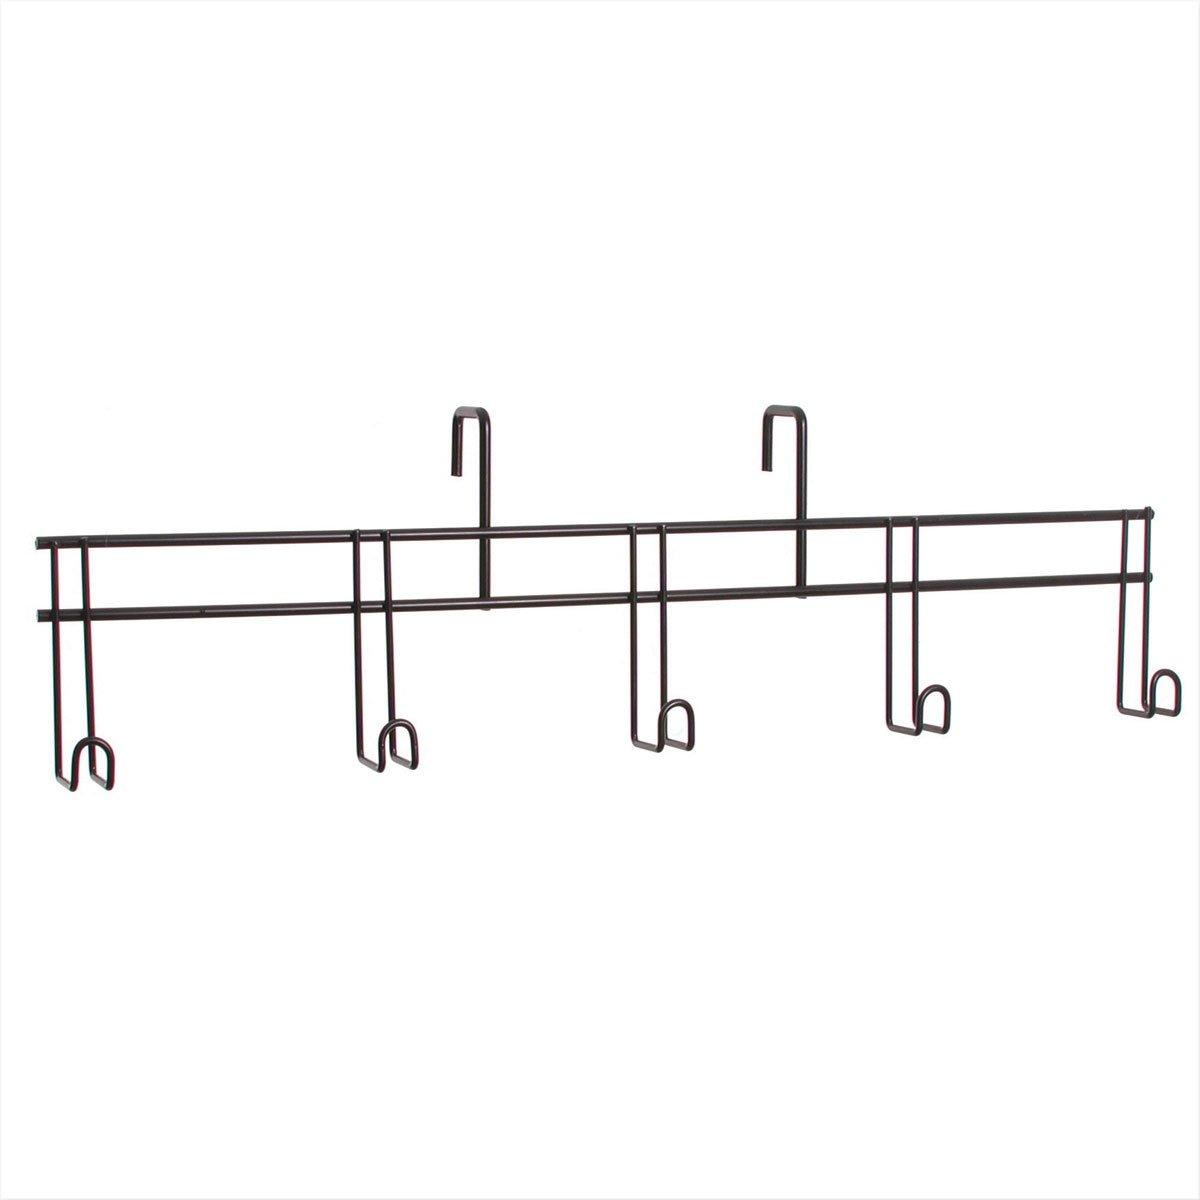 Tough 1 5 Hook Tack Rack, Black